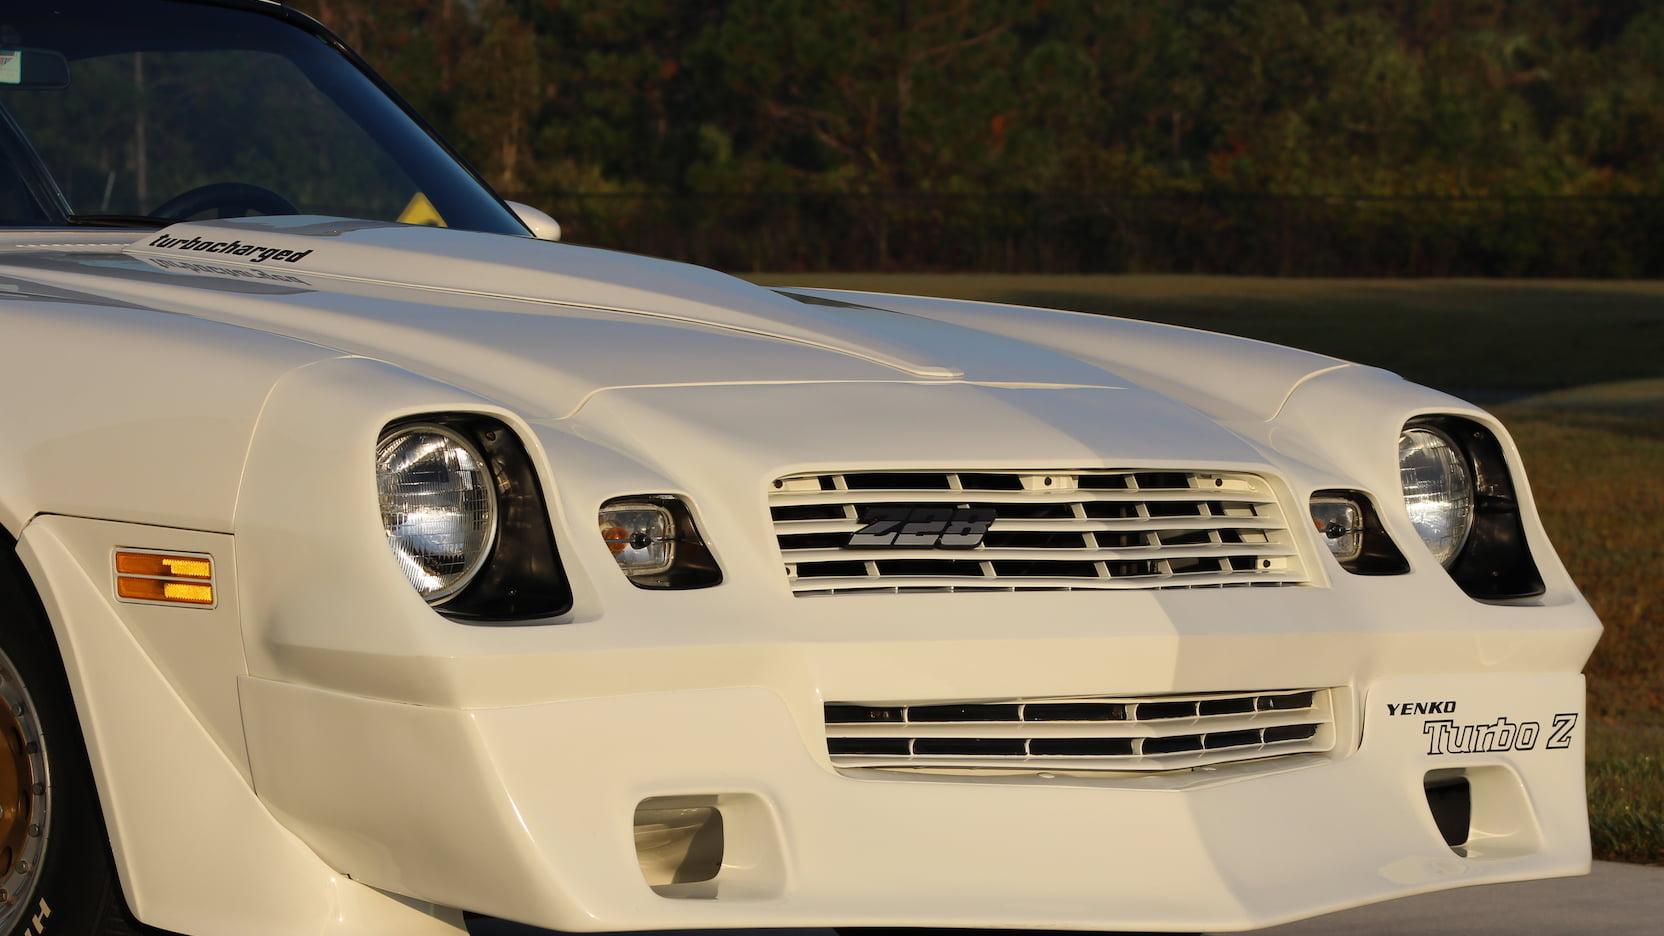 1981 Chevrolet Yenko Turbo Z nose